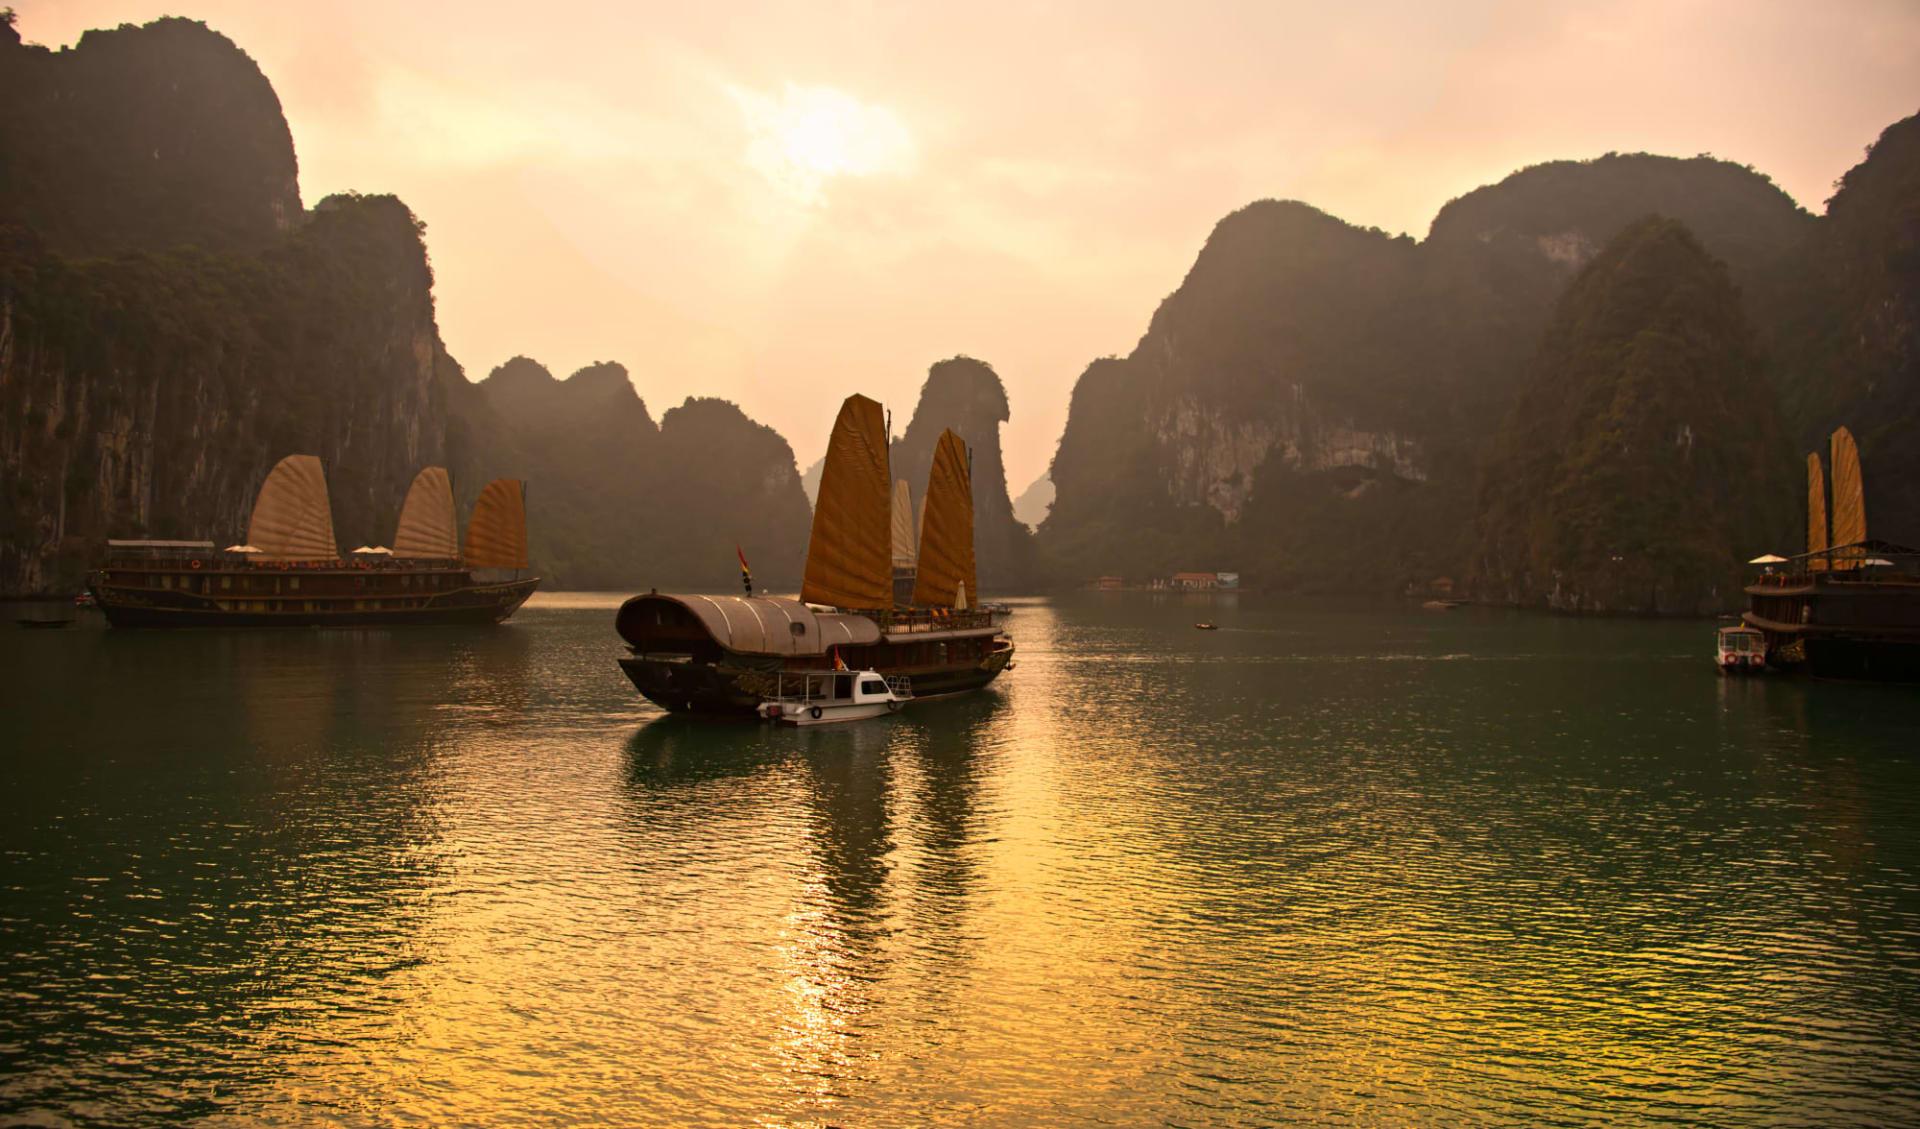 Impressionen Nordvietnams & Halong Bay Kreuzfahrt ab Hanoi: Halong Bay Vietnam Unesco World Heritage Site